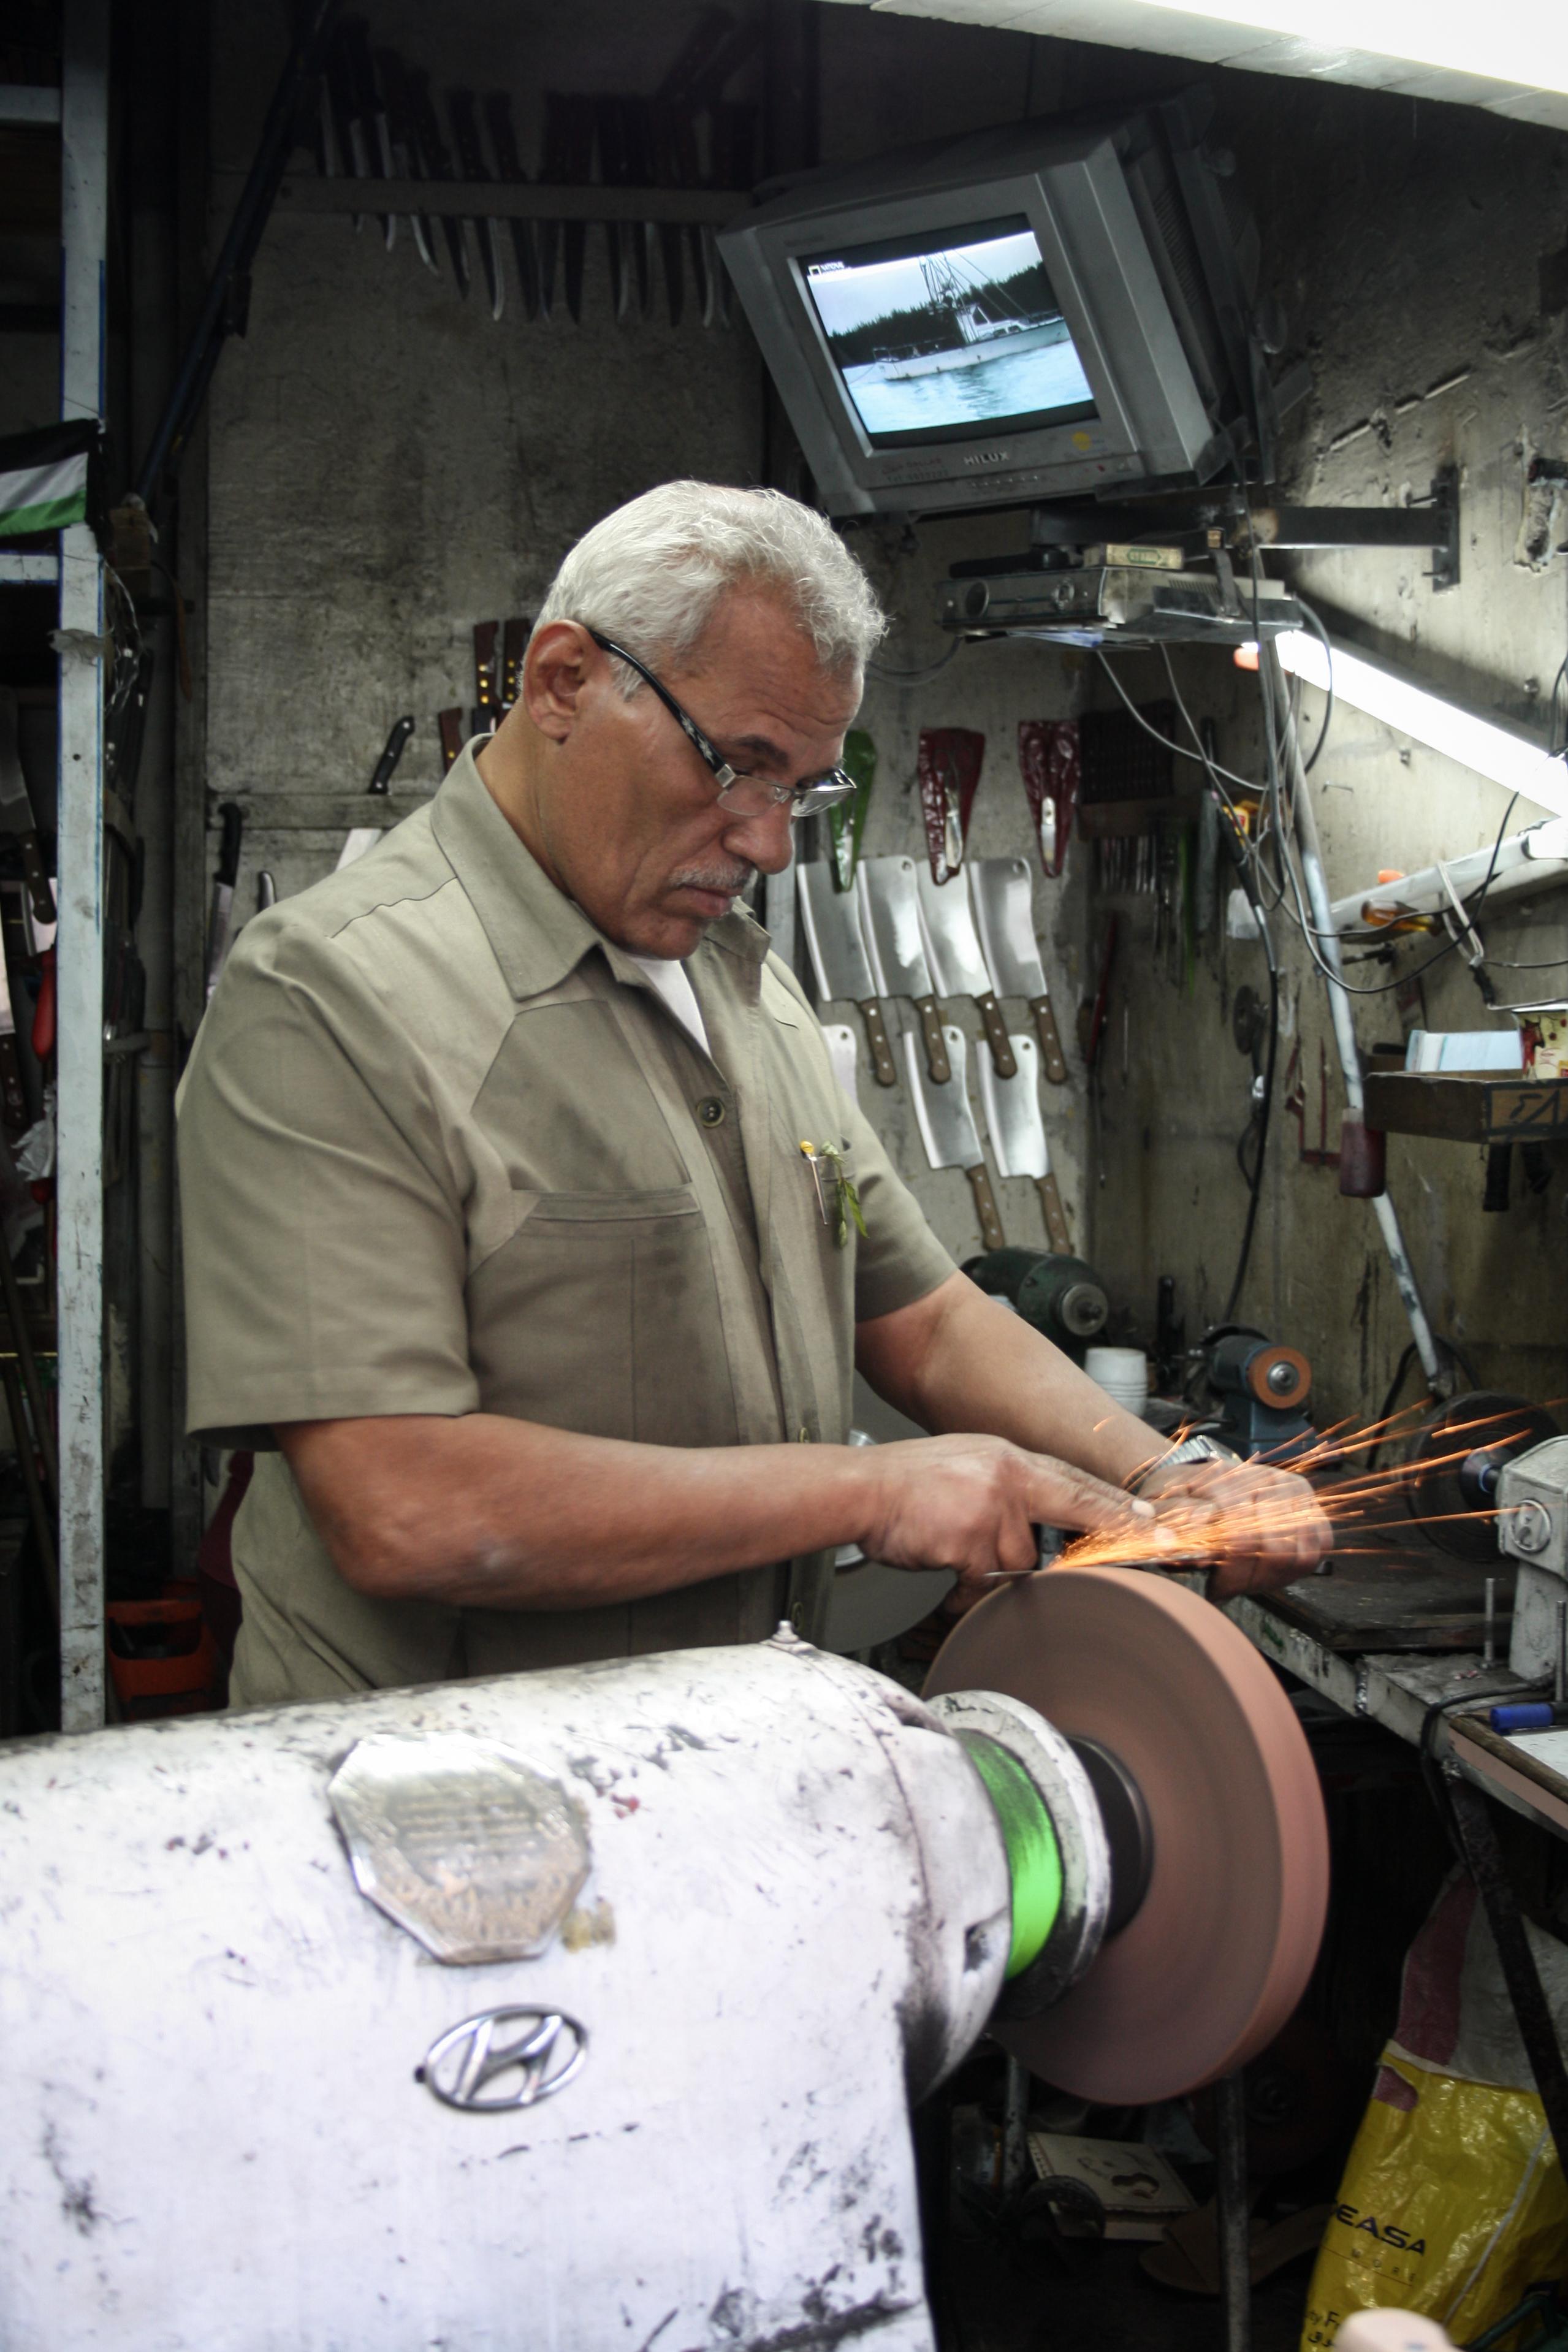 A skilled blacksmith's workshop